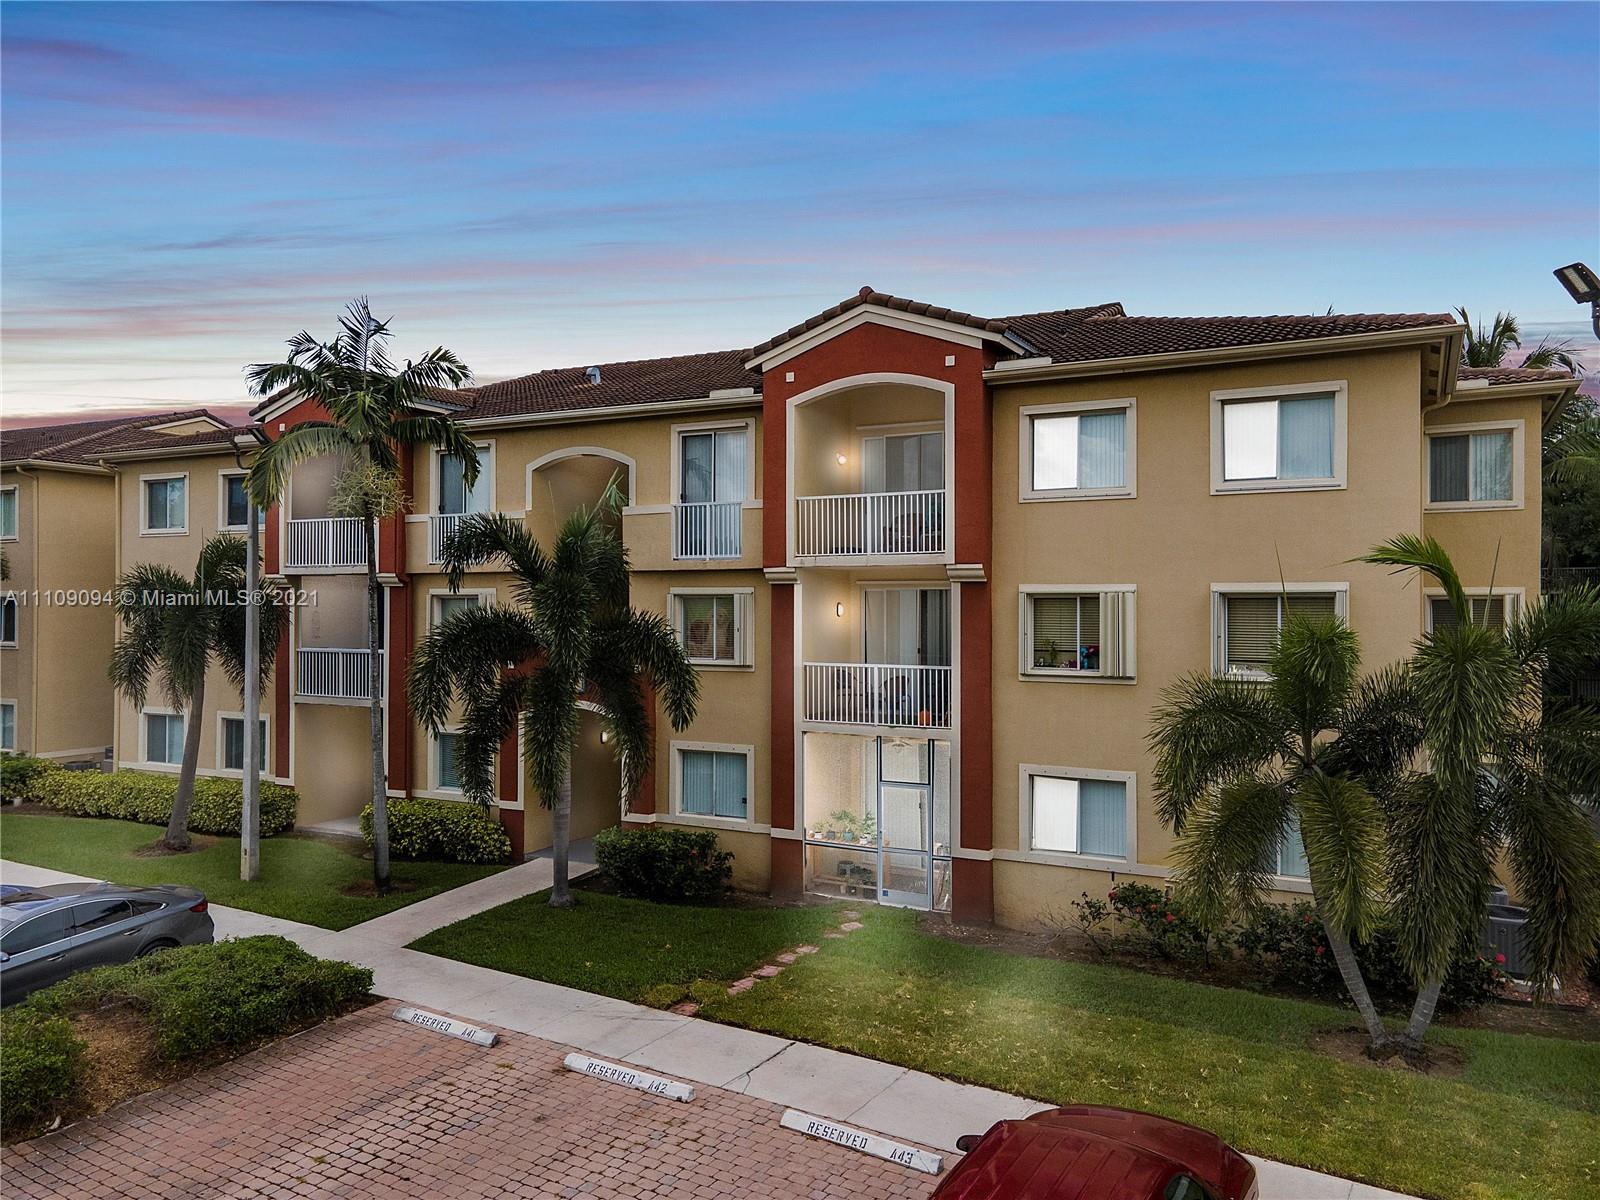 7085 Nova Dr Unit 302, Davie, Florida 33317